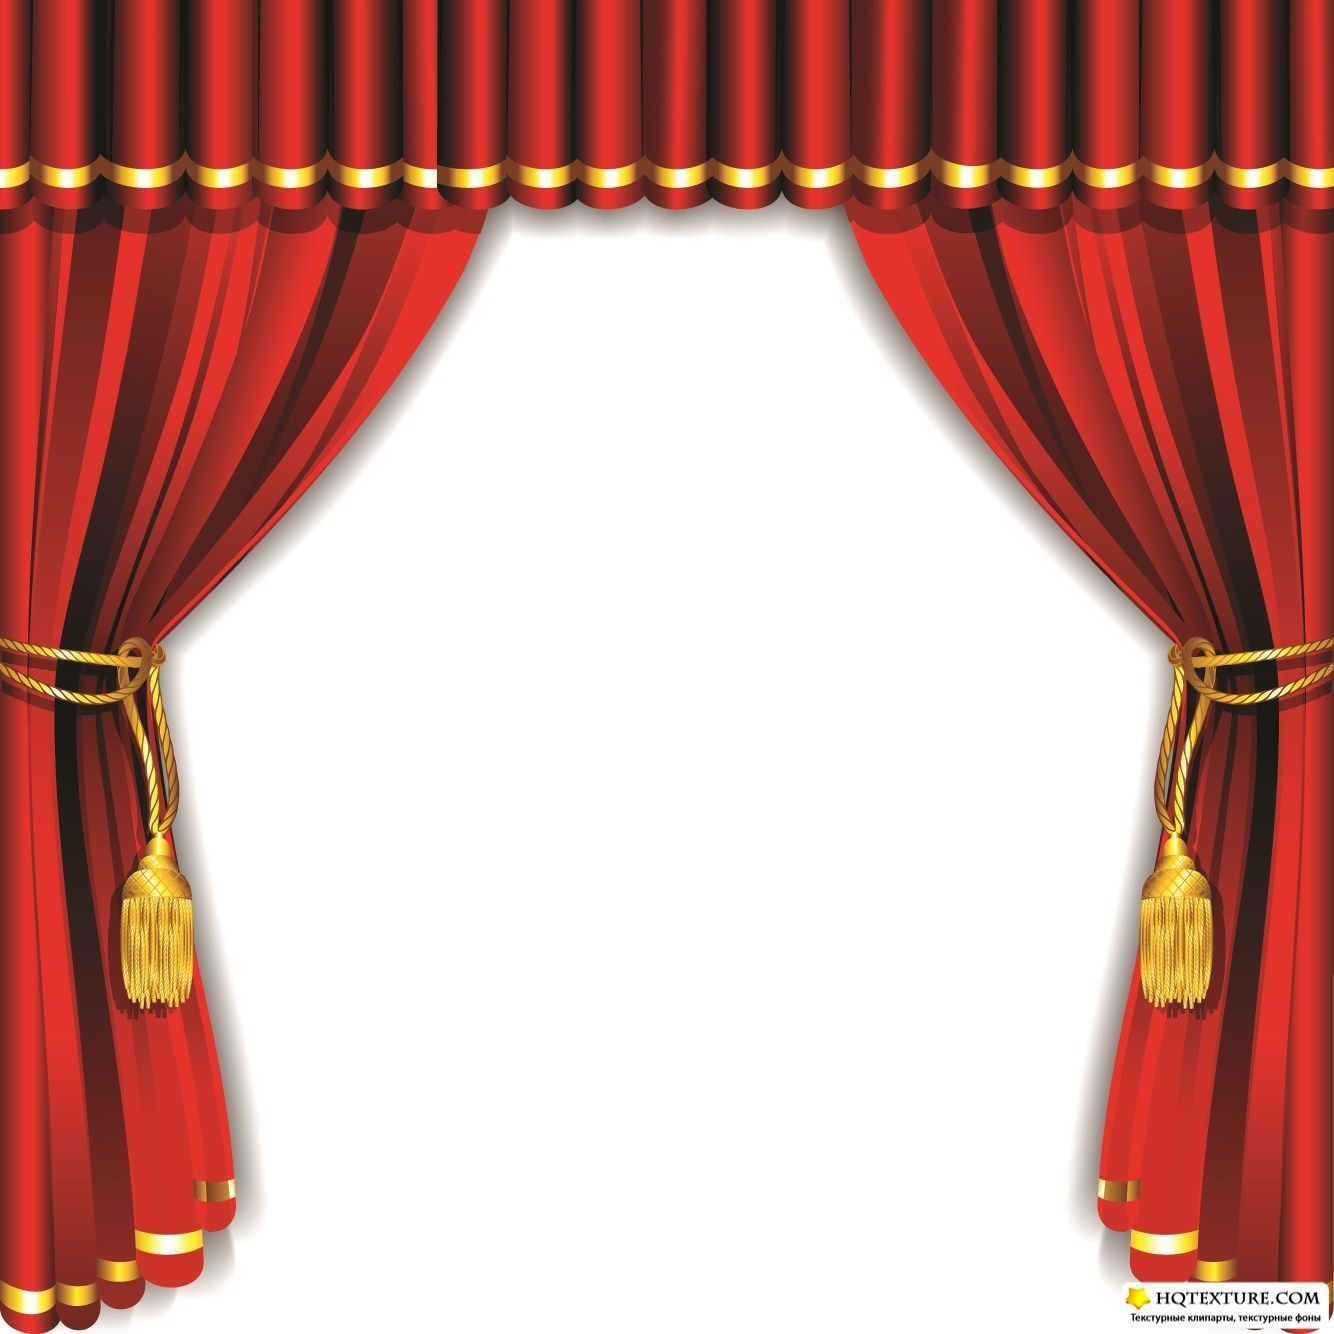 Red Drapes And Curtains Red Curtain 297 Mb Rar 8 82 Mb Ckachivanij 38 Cutecurtainsideas Curtains Vector Stage Curtains Theatre Curtains